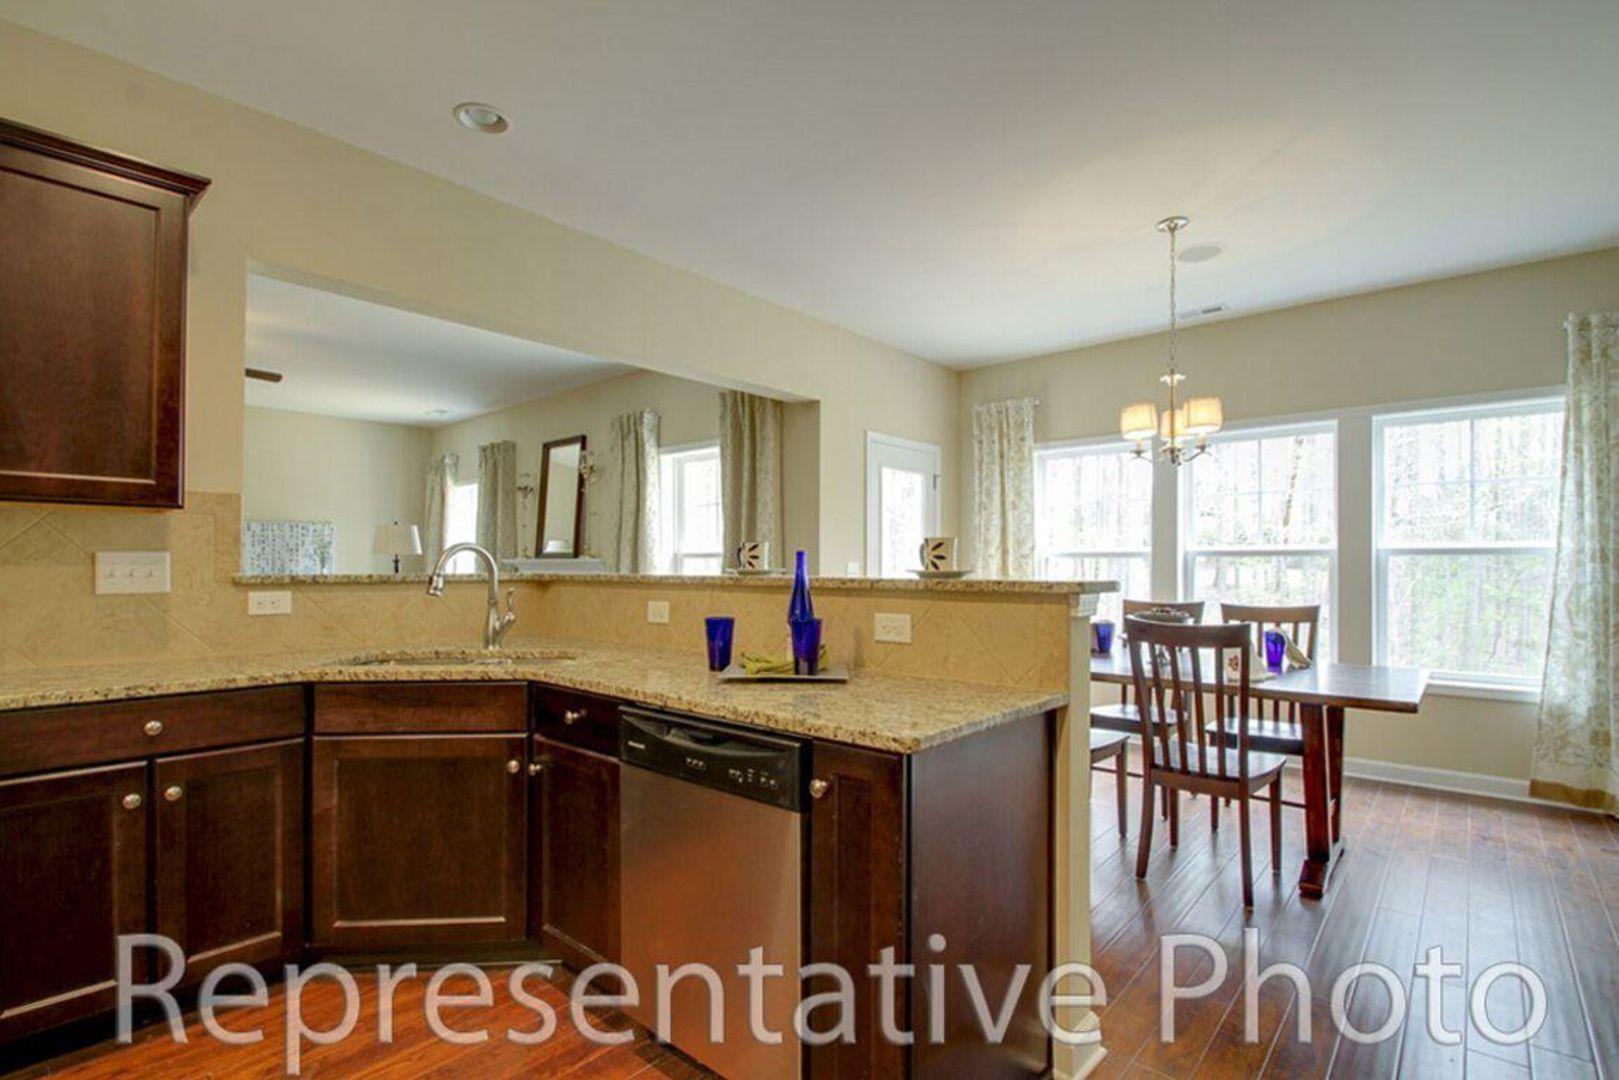 Kitchen-in-Roosevelt-at-Riverwood-in-Linden